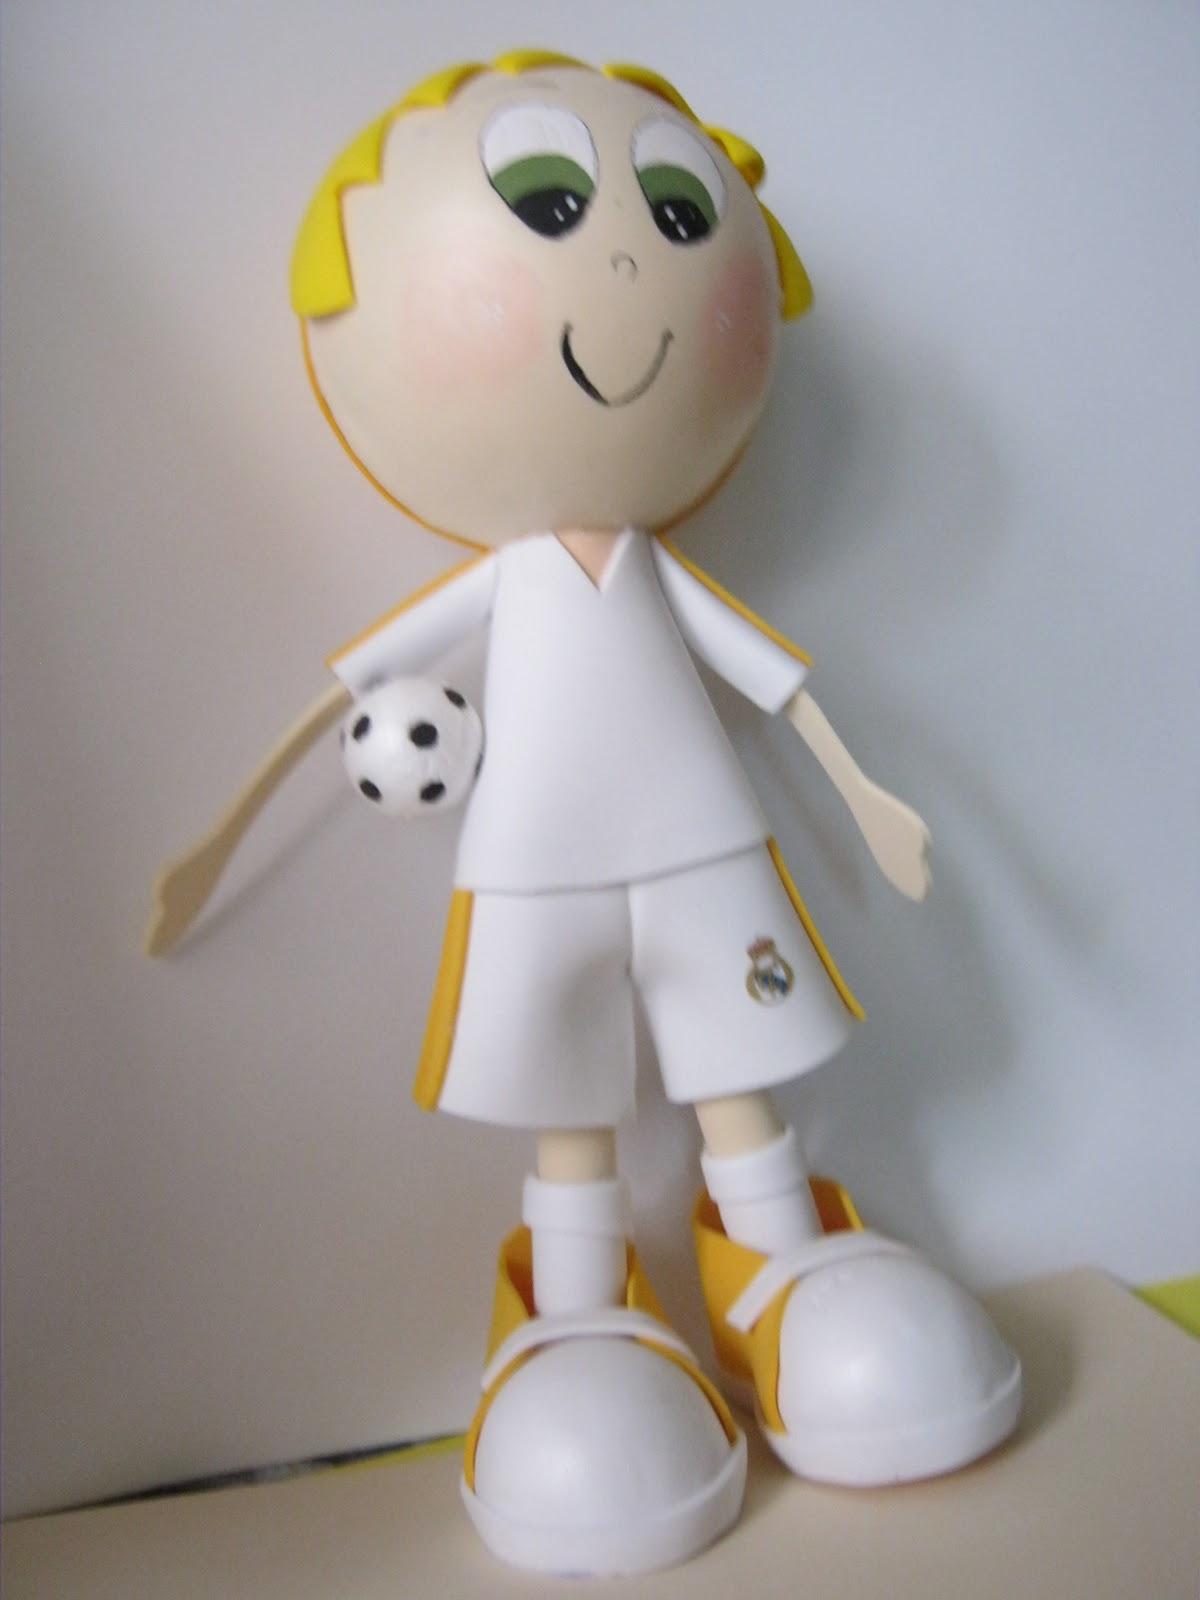 muñecos futbolistas real madrid foamy goma eva